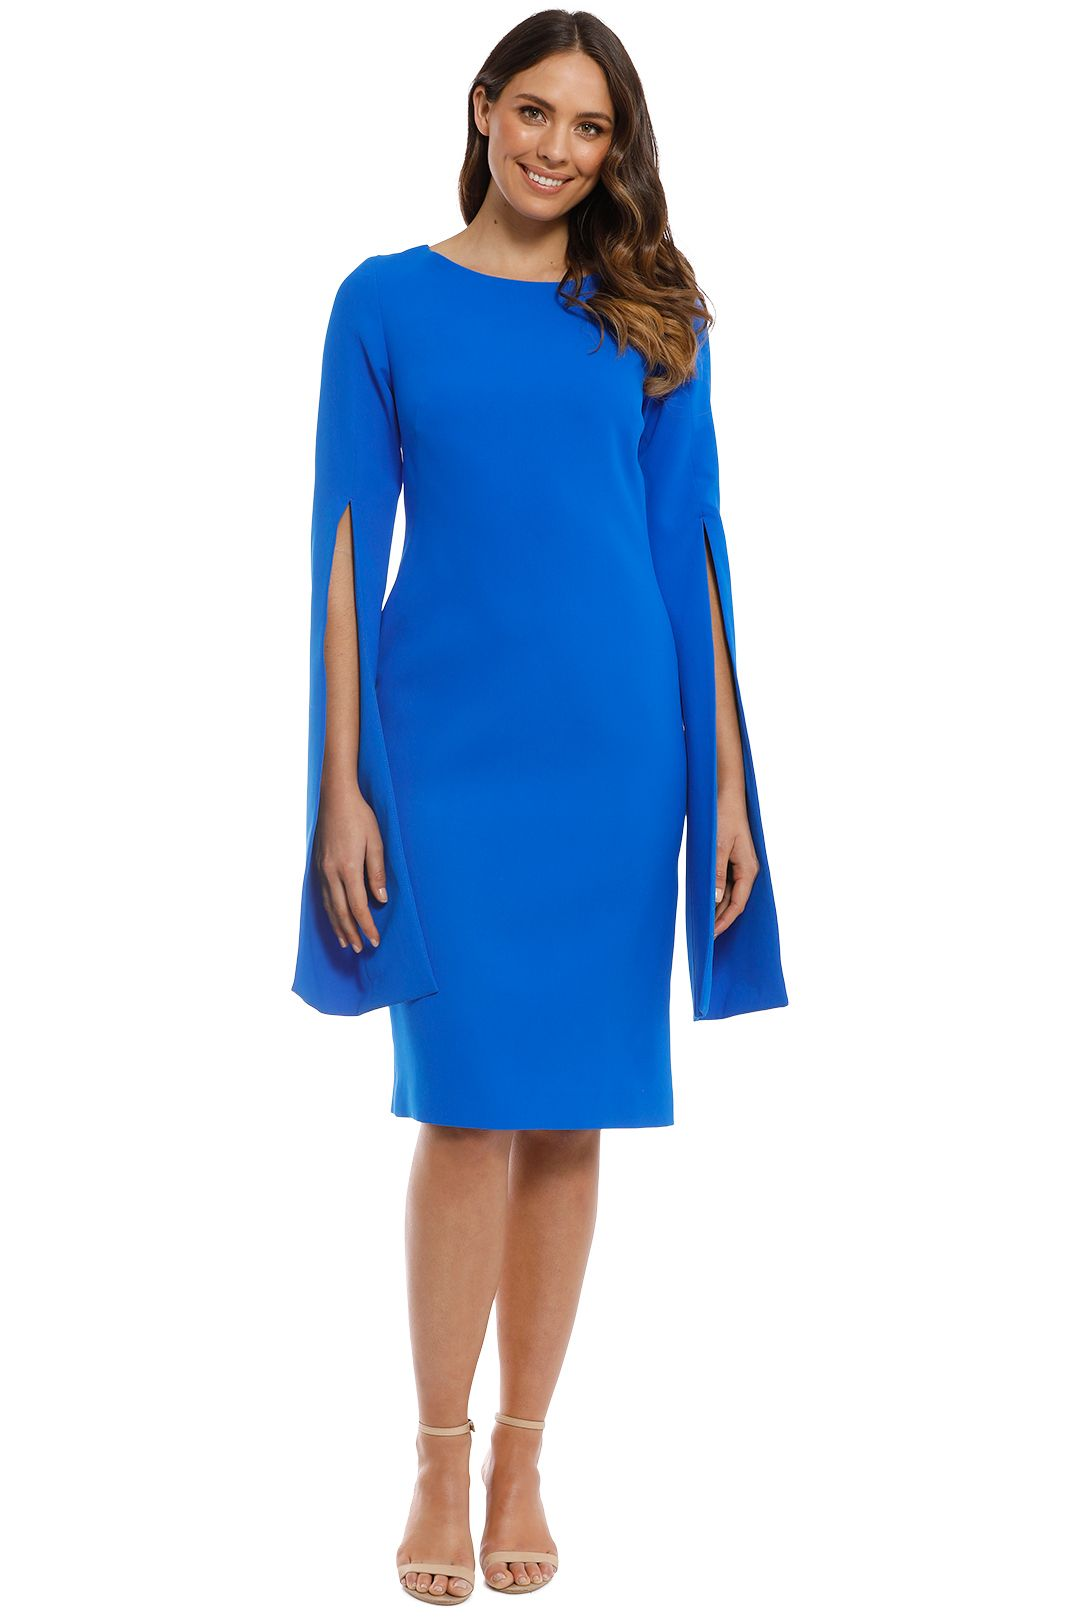 Trelise Cooper - Up Your Sleeve Dress - Cobalt - Front